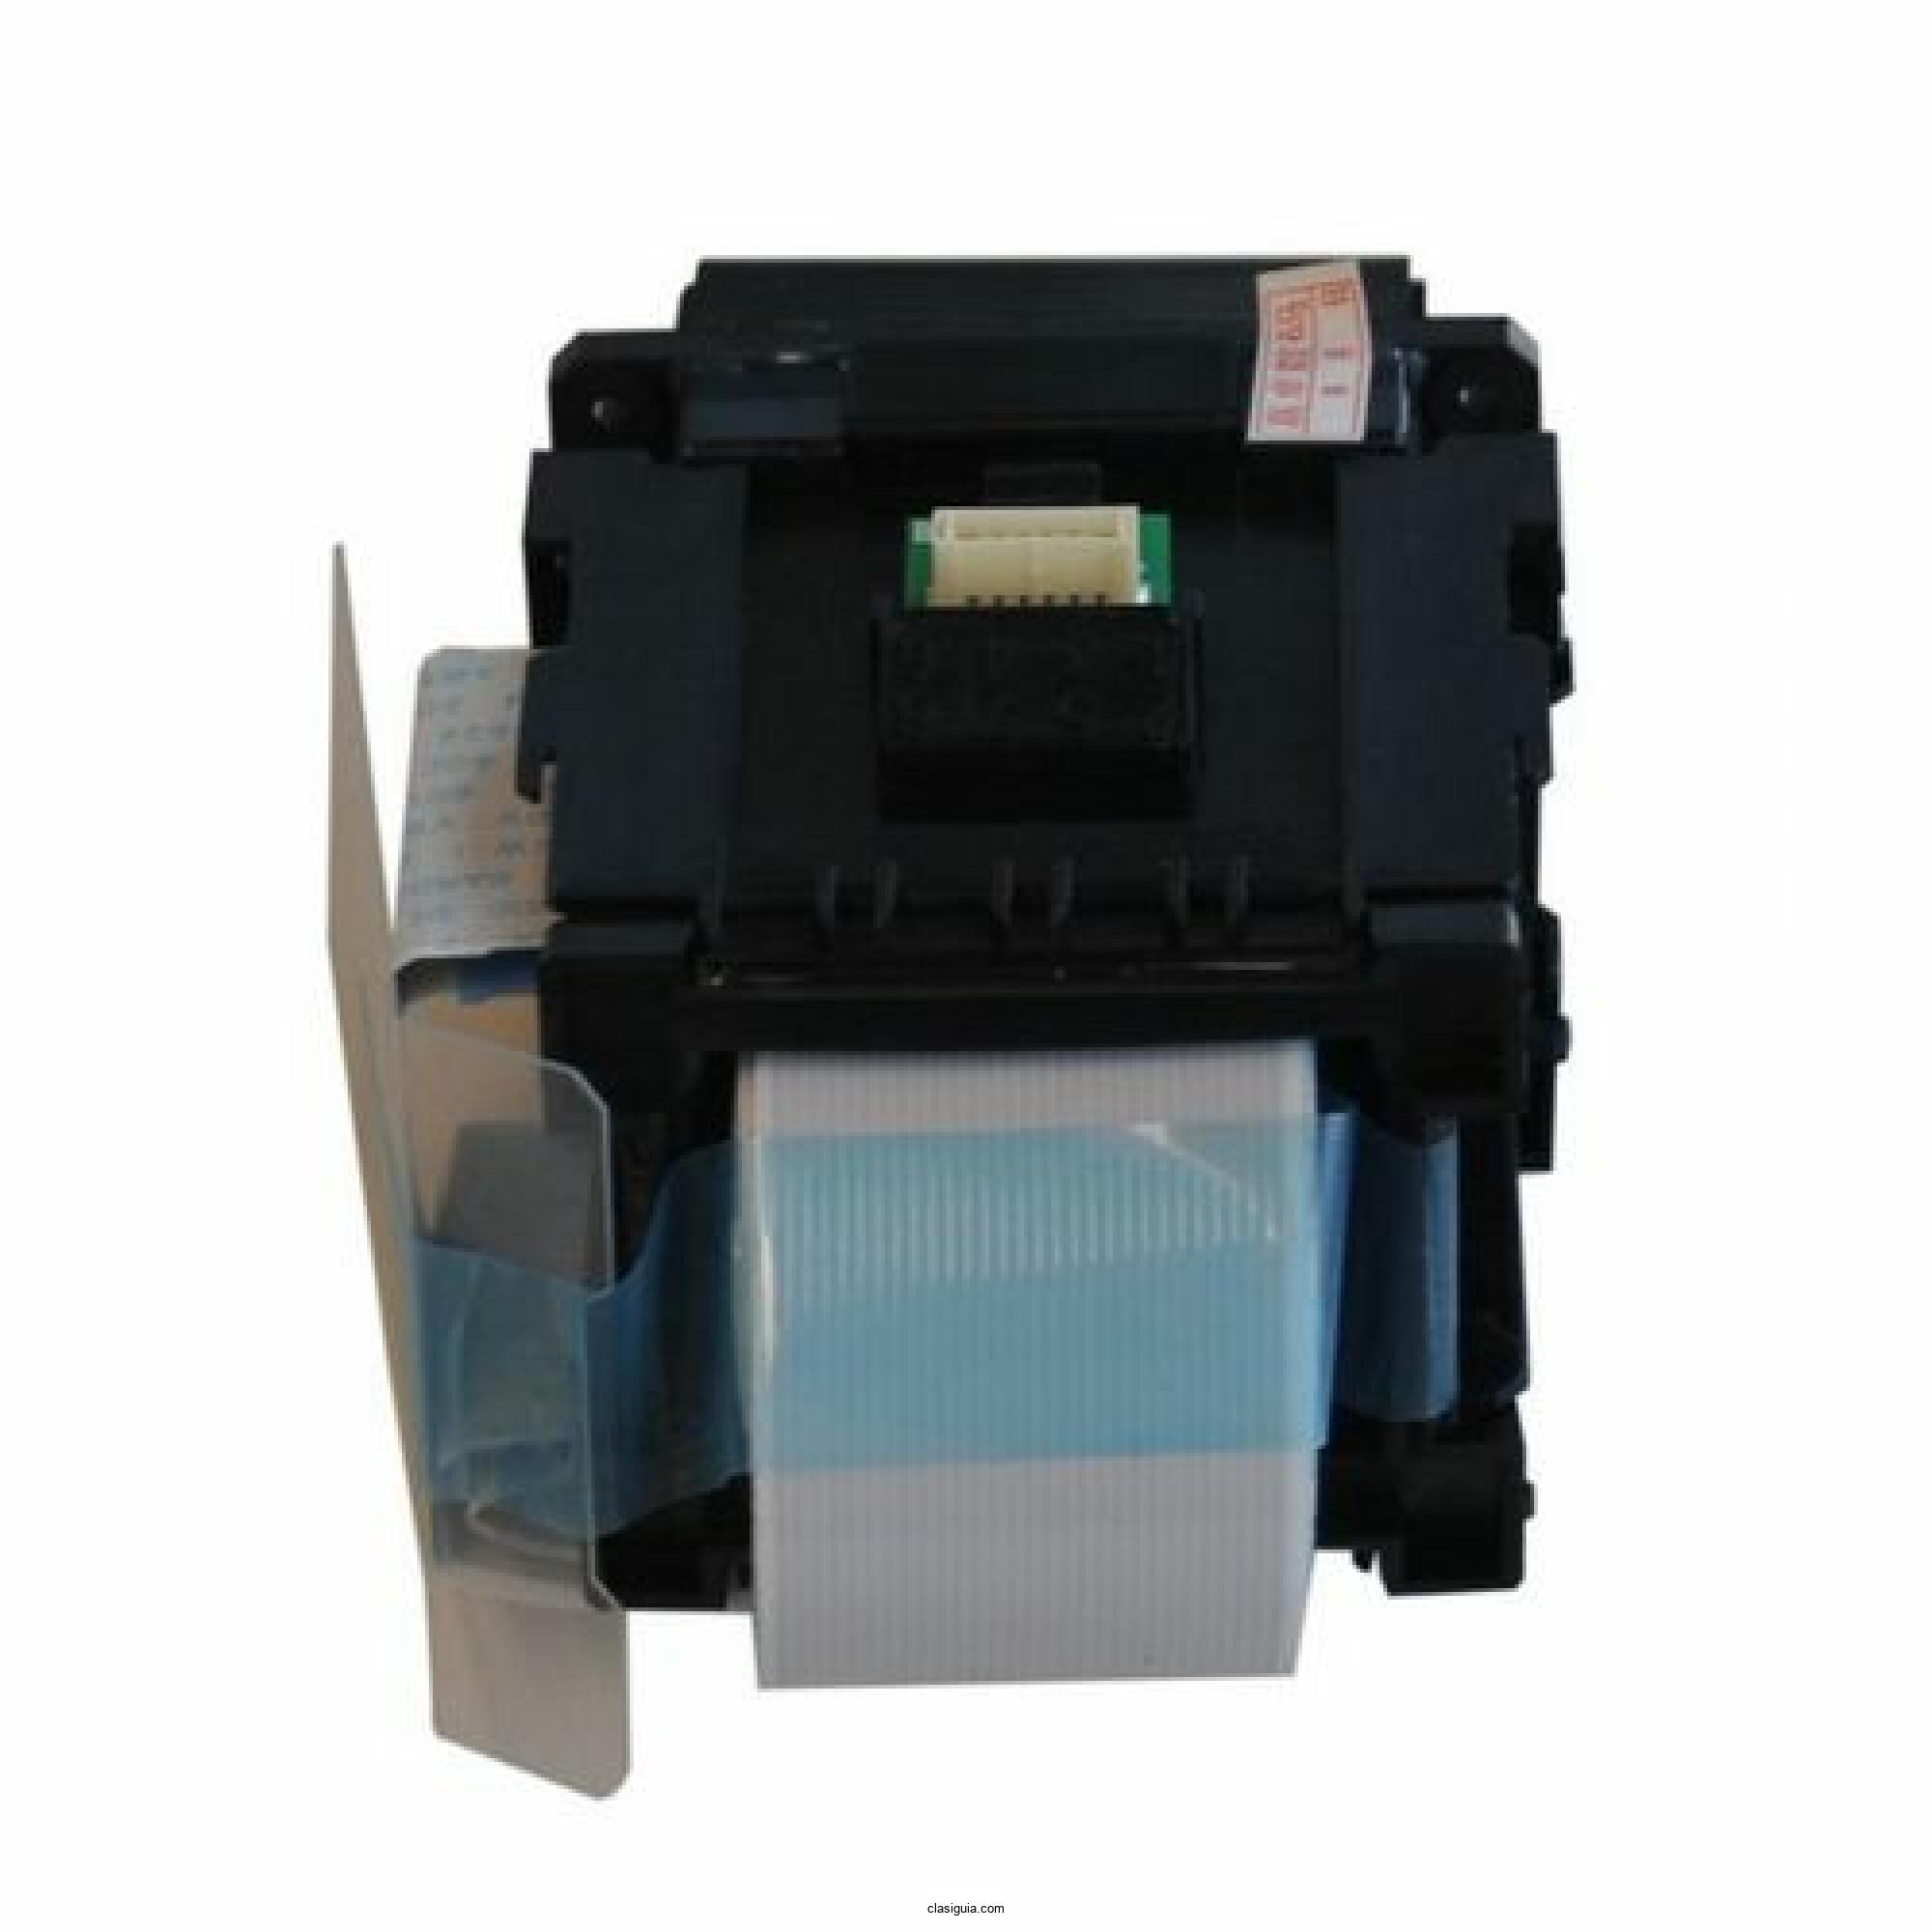 MIMAKI CJV300-150 Printhead-M015372 (INDOELECTRONIC)